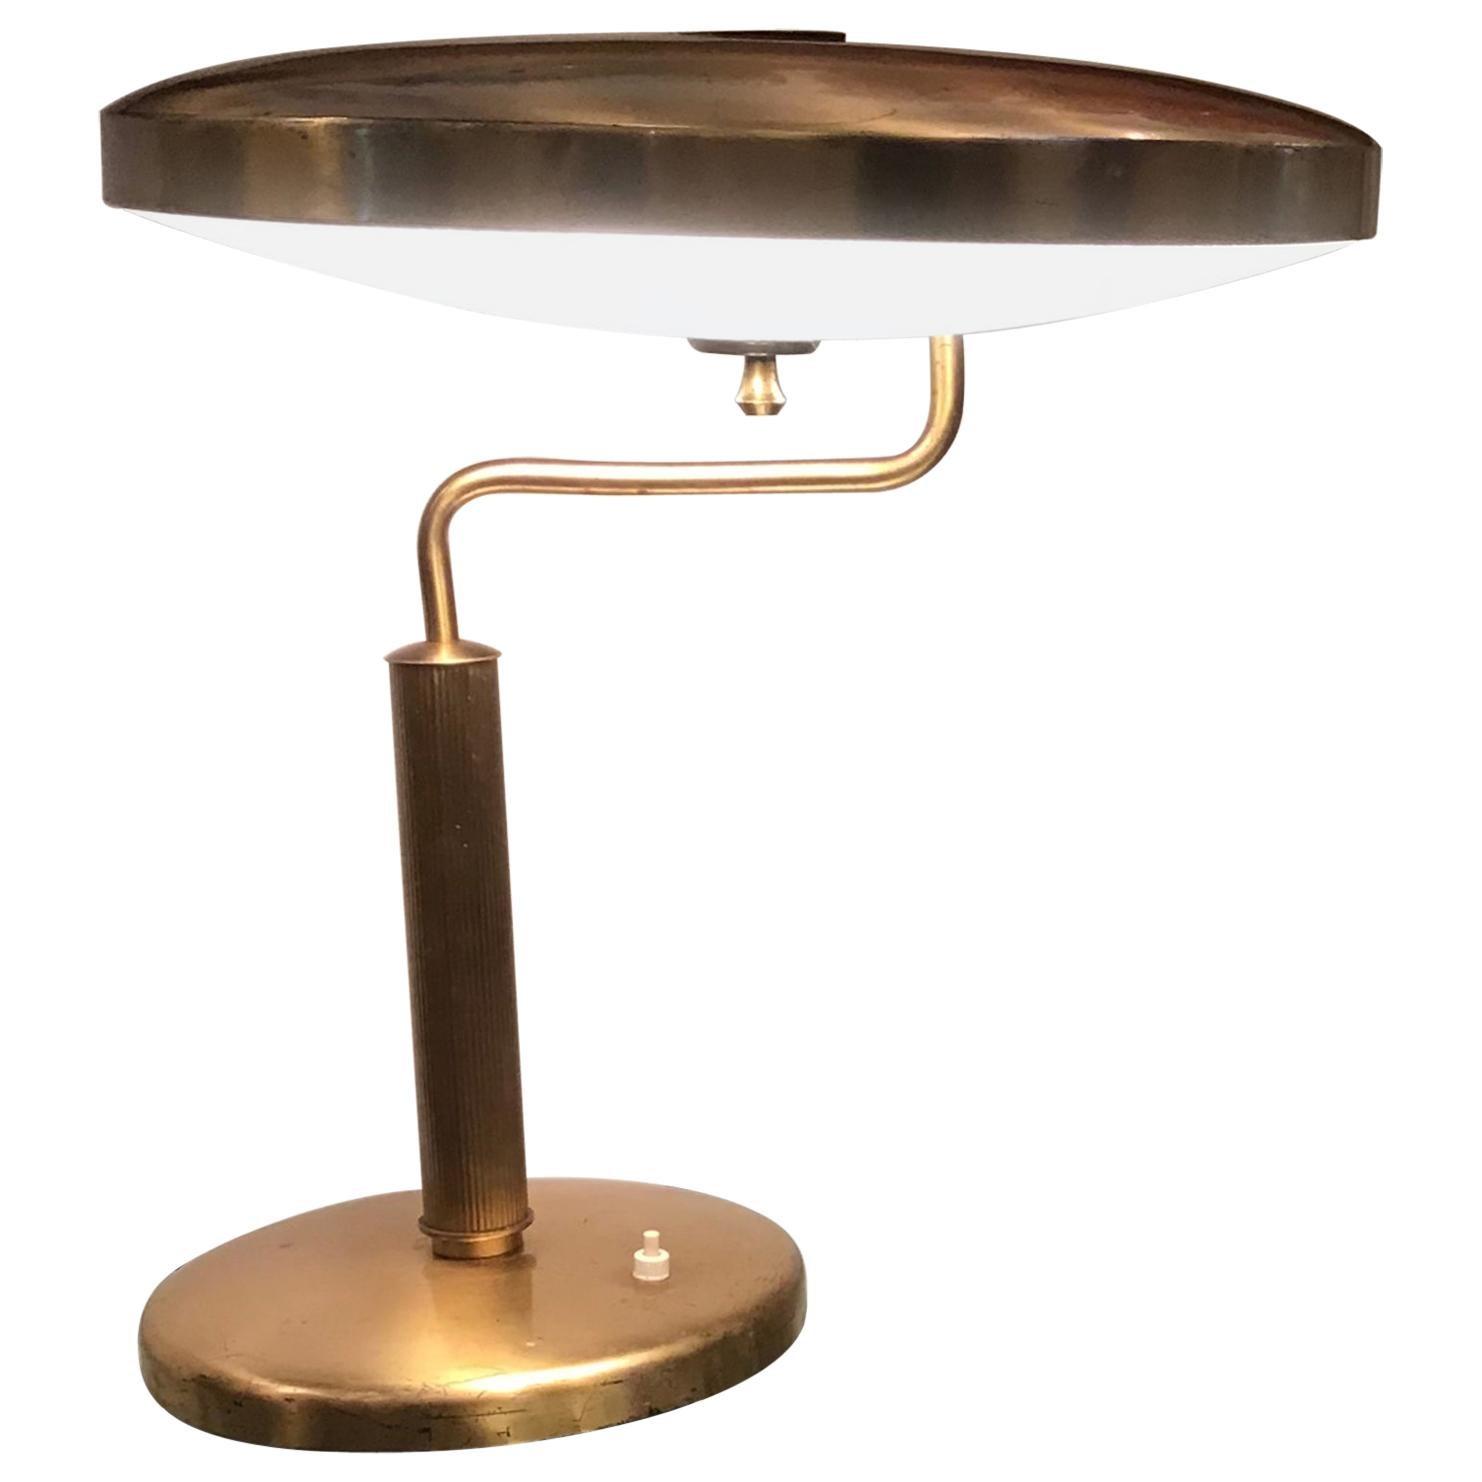 Fontana Arte Table Lamp Brass Glass, 1950, Italy